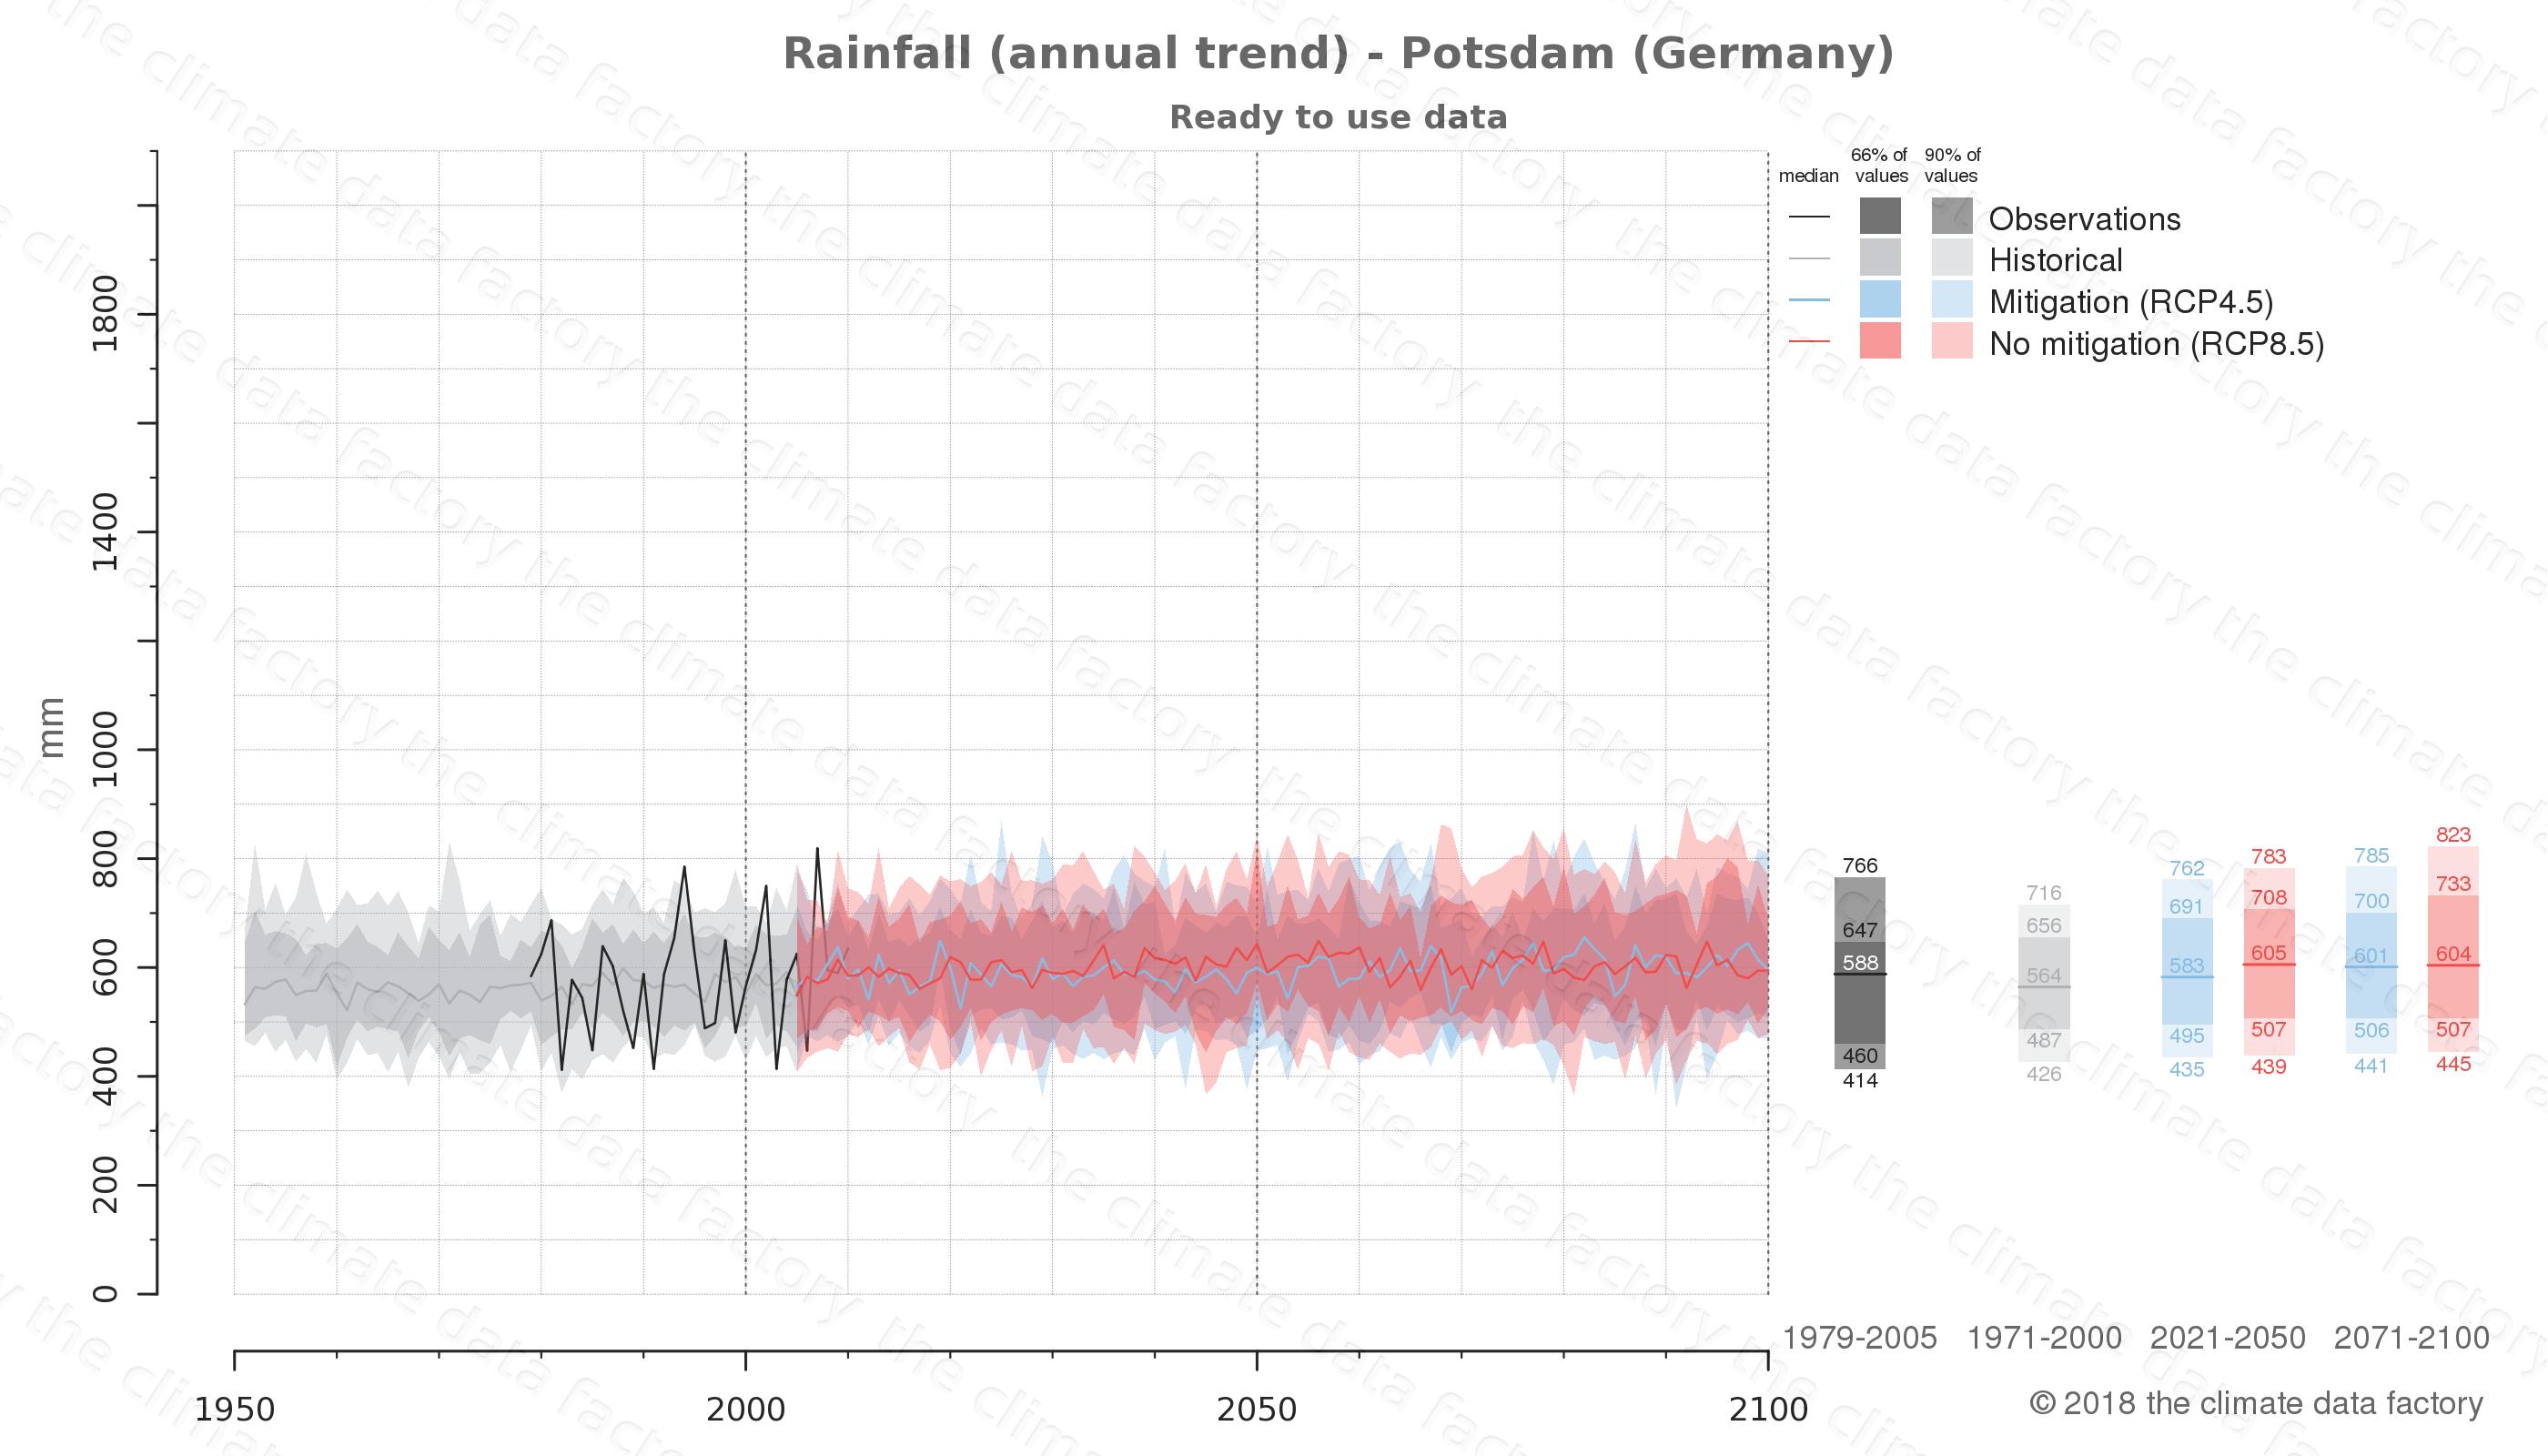 climate change data policy adaptation climate graph city data rainfall potsdam germany